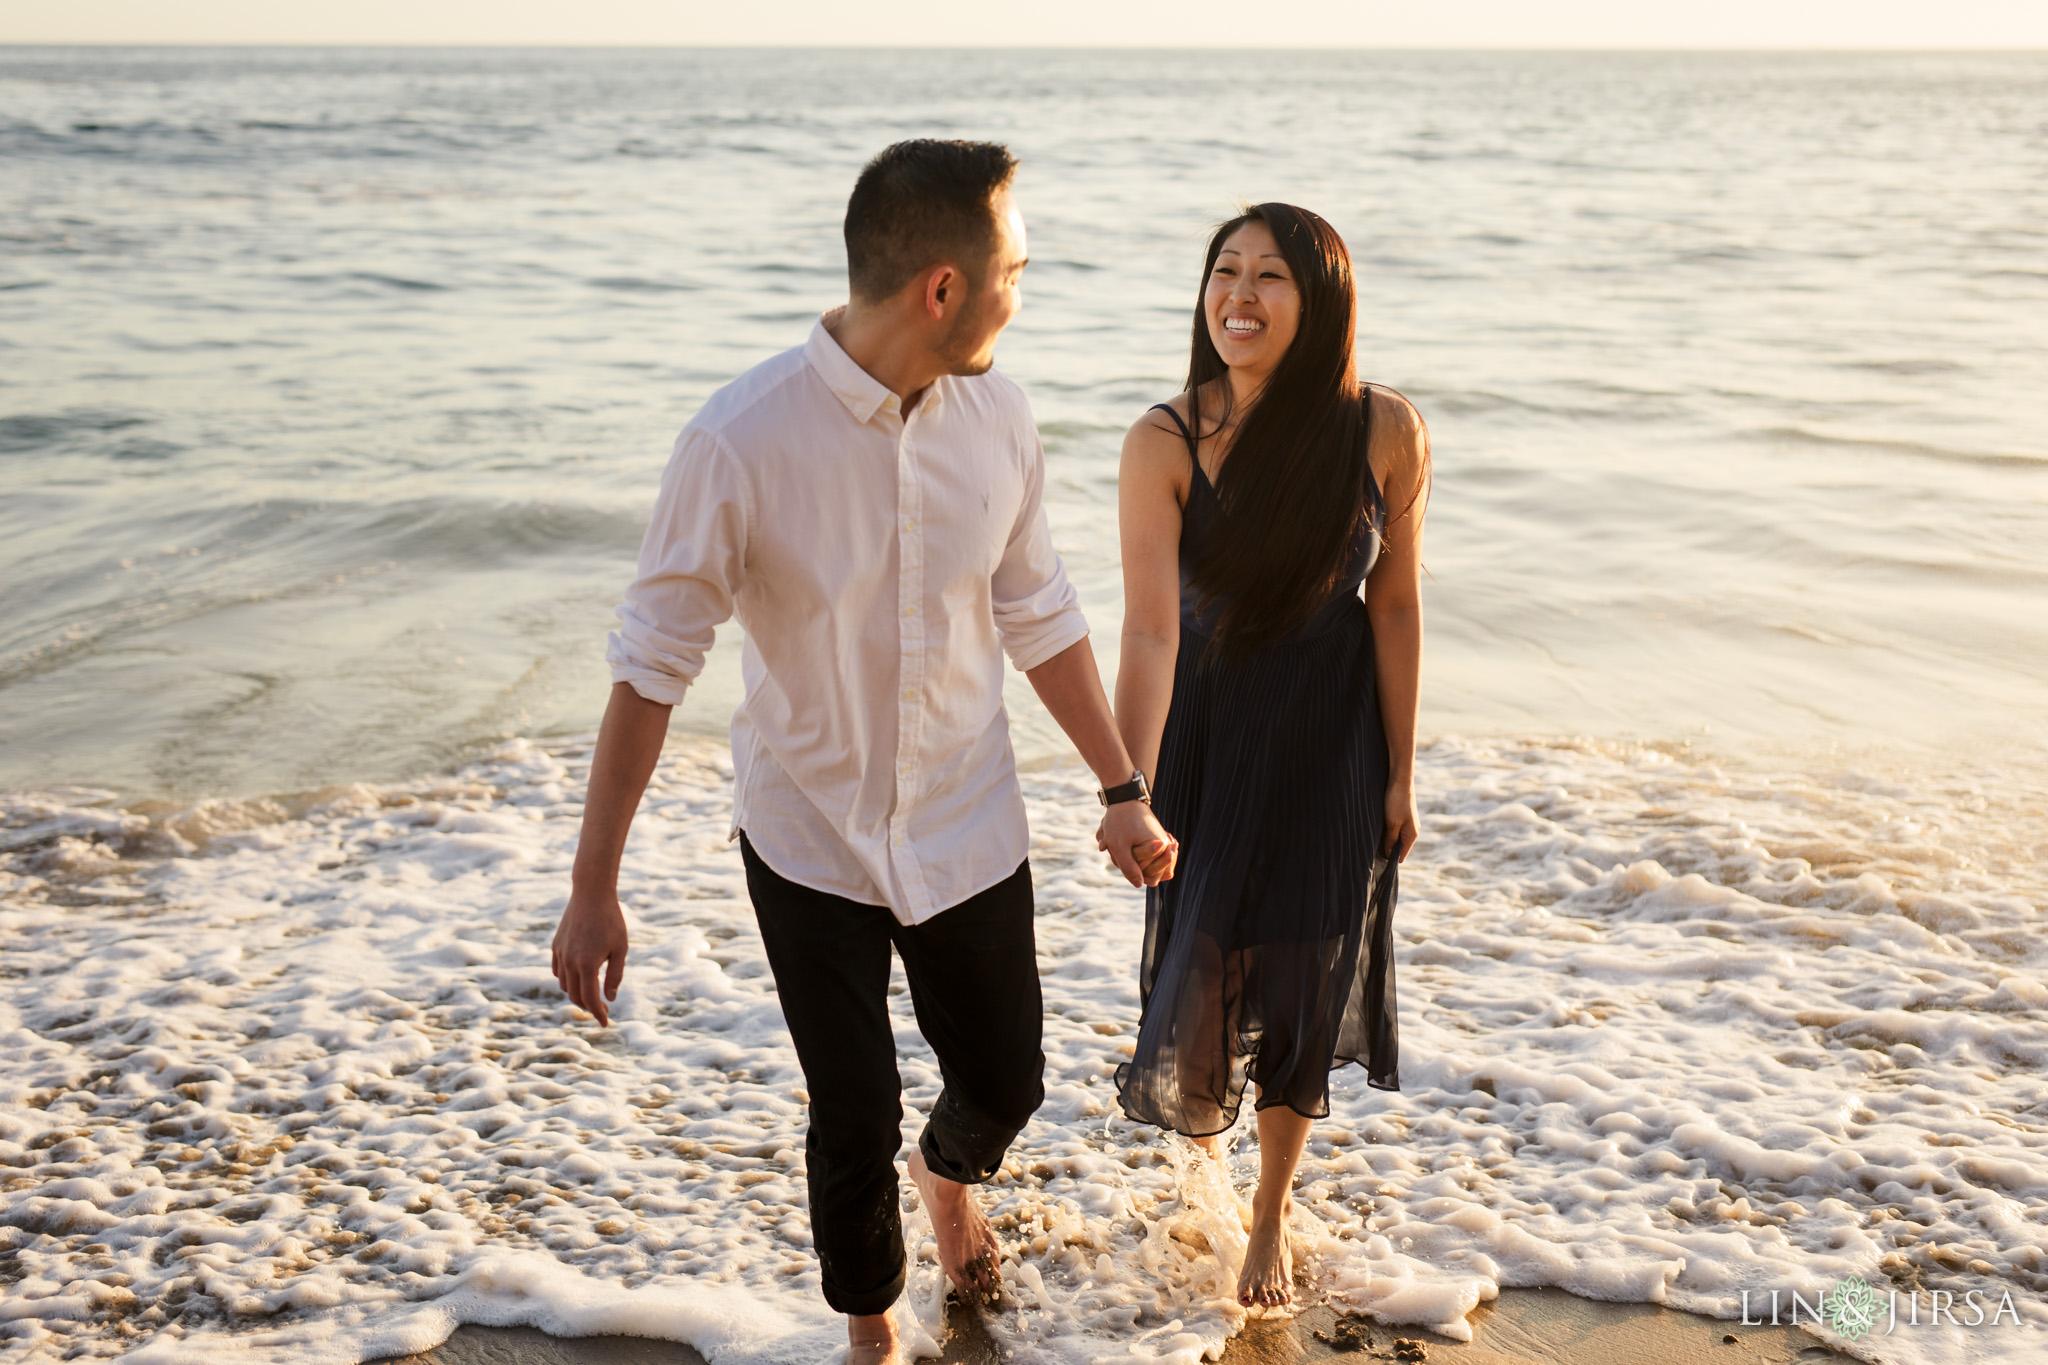 08 Heisler Beach Orange County Proposal Engagement Photography